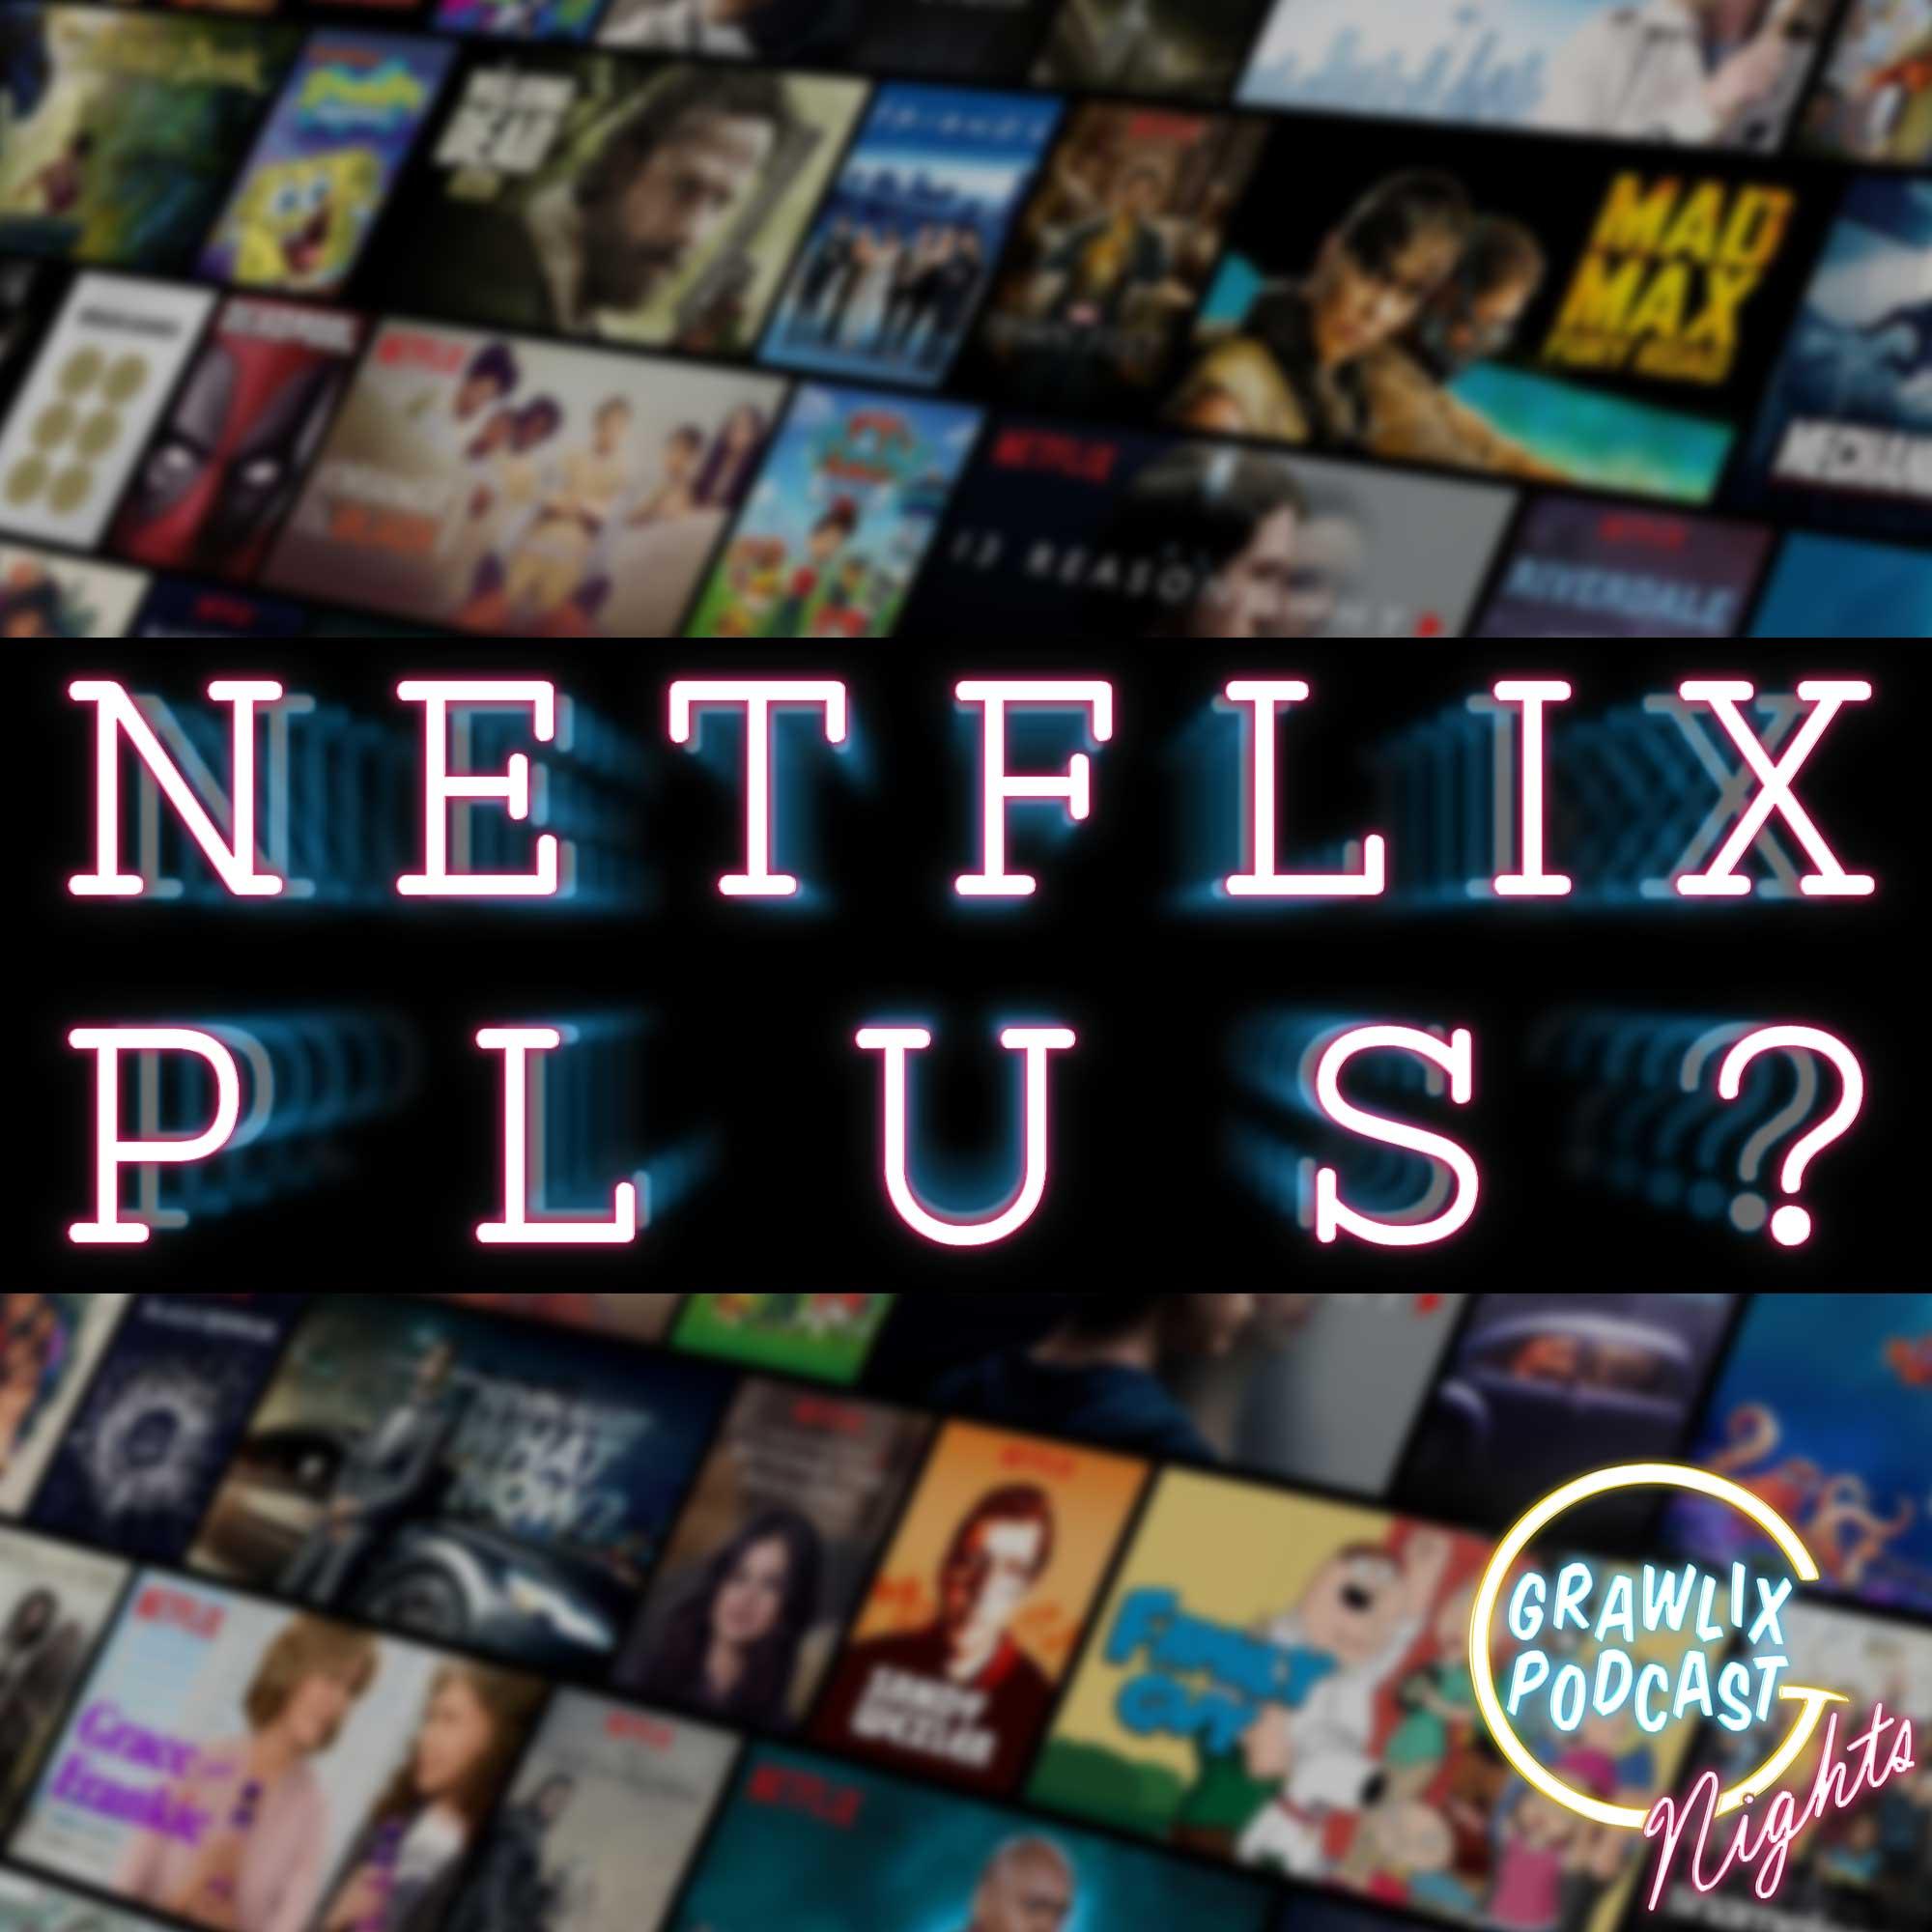 Netflix Plus!? - Nights